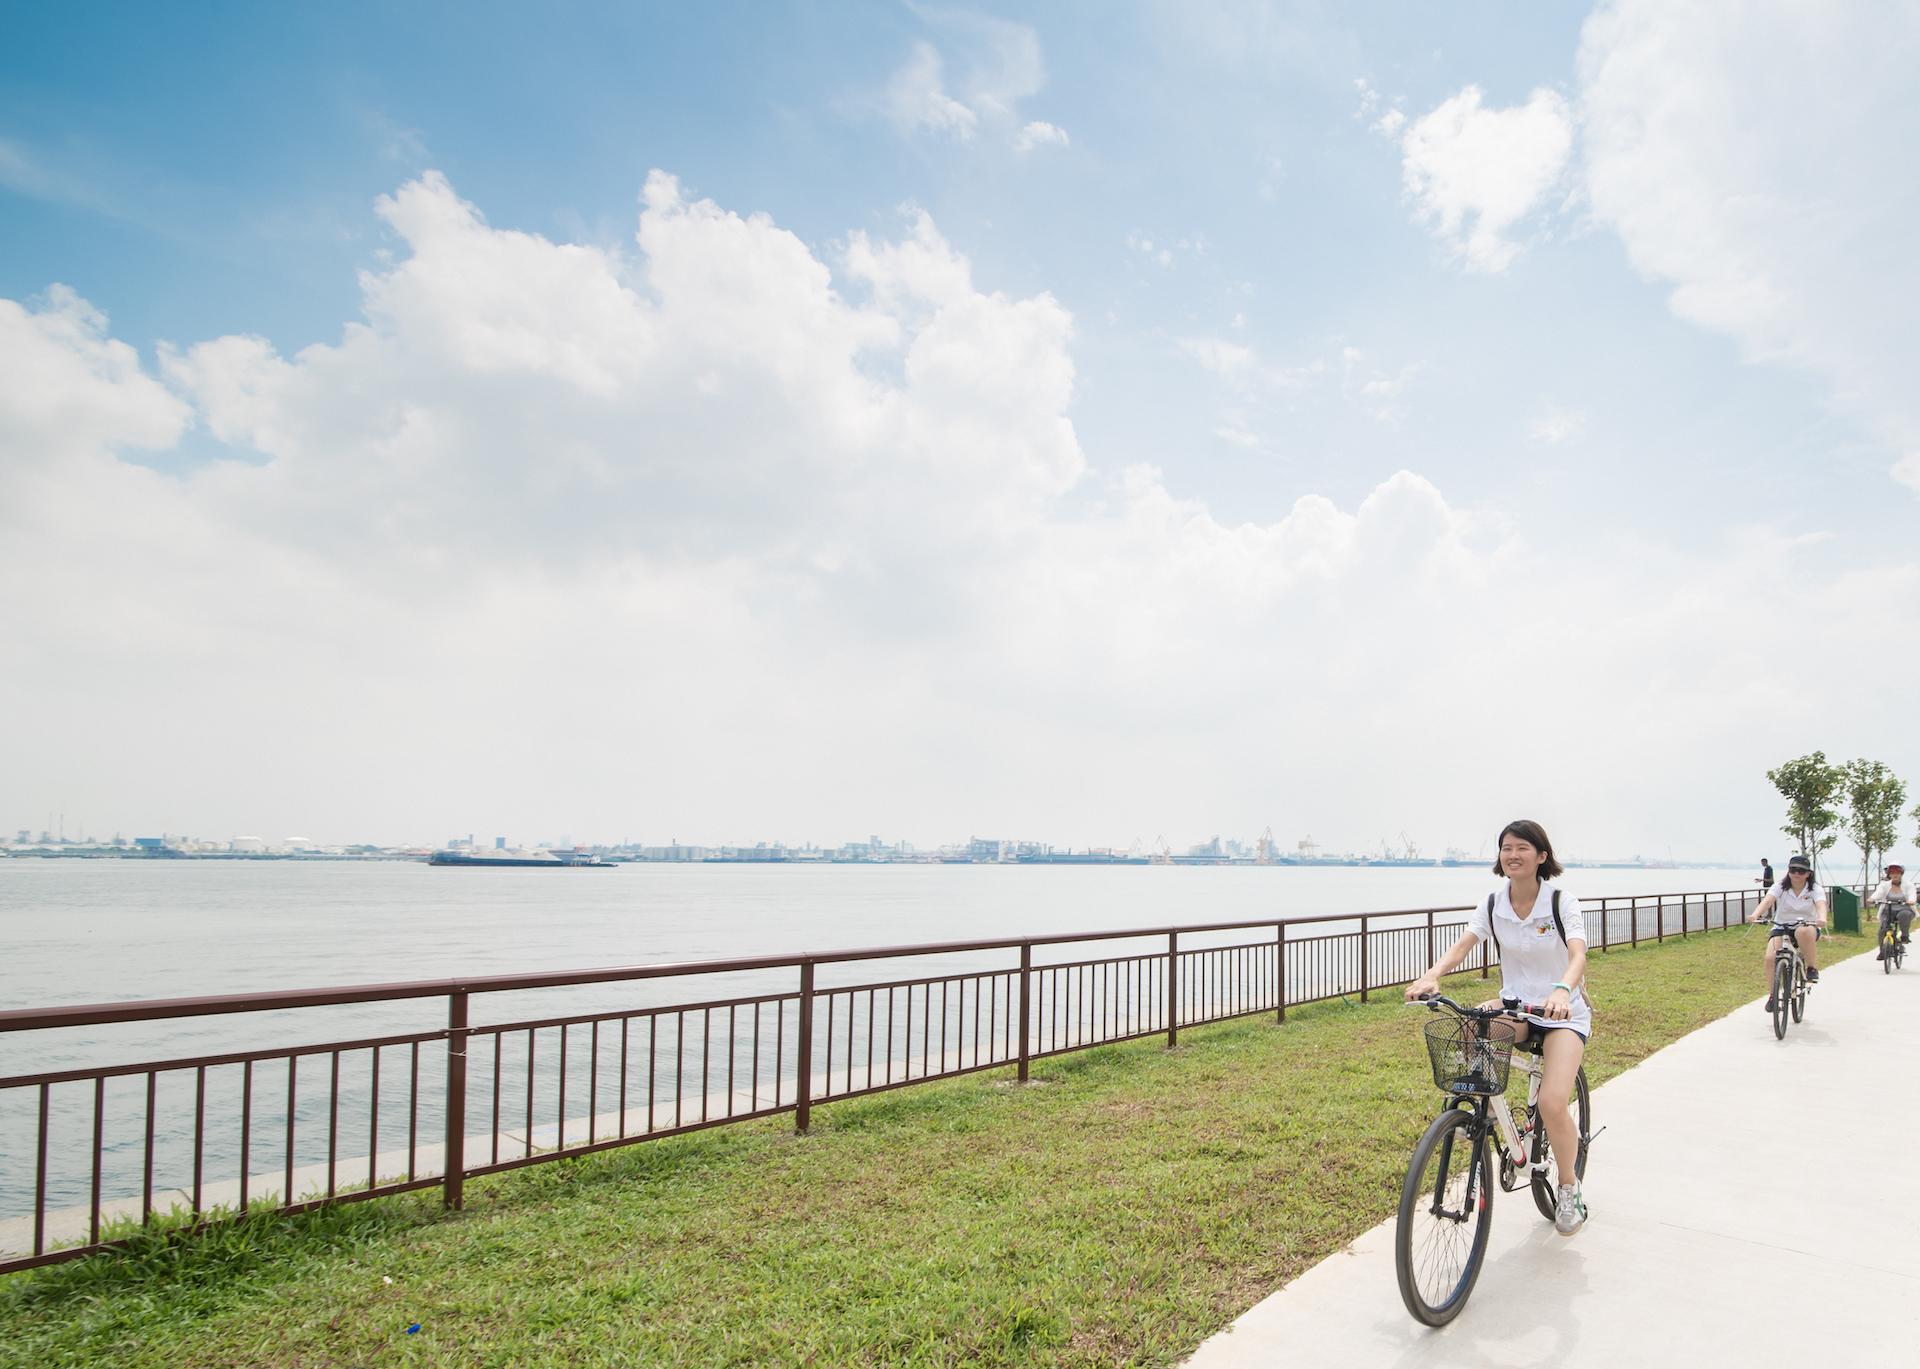 Silver YOLO - Cycling Programme